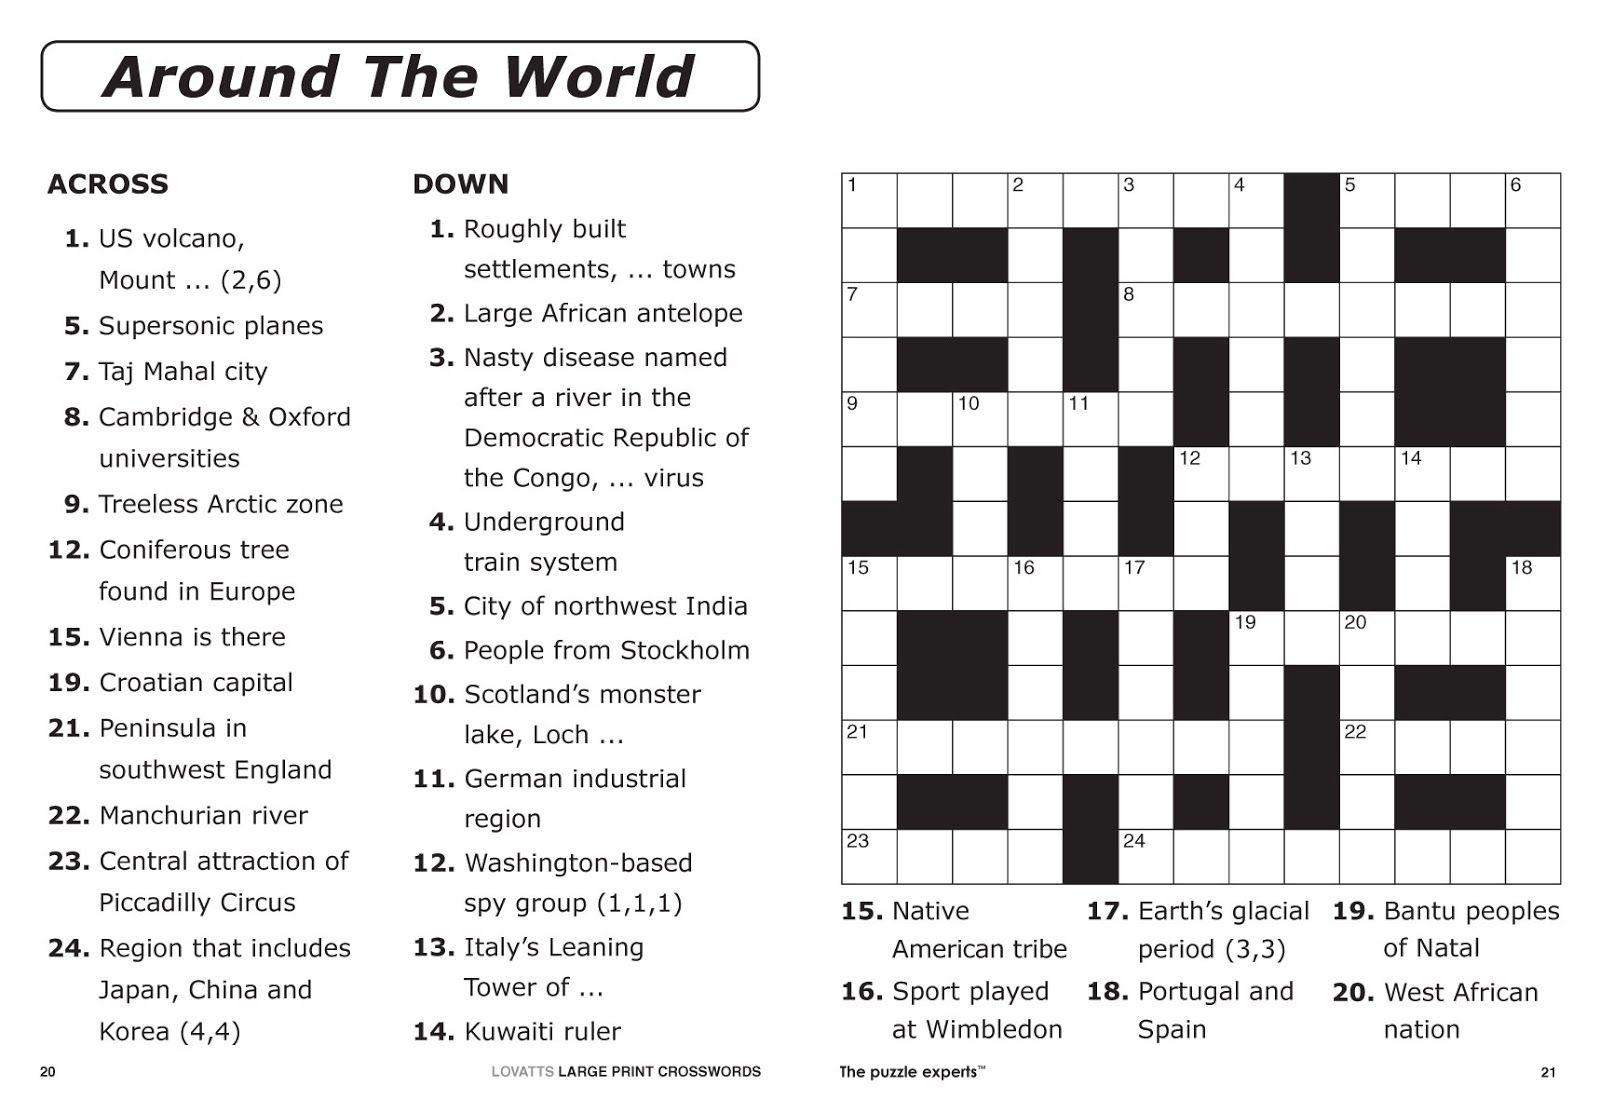 Easy Printable Crossword Puzzles | Elder Care & Dementia Care - Free - Very Easy Printable Crossword Puzzles